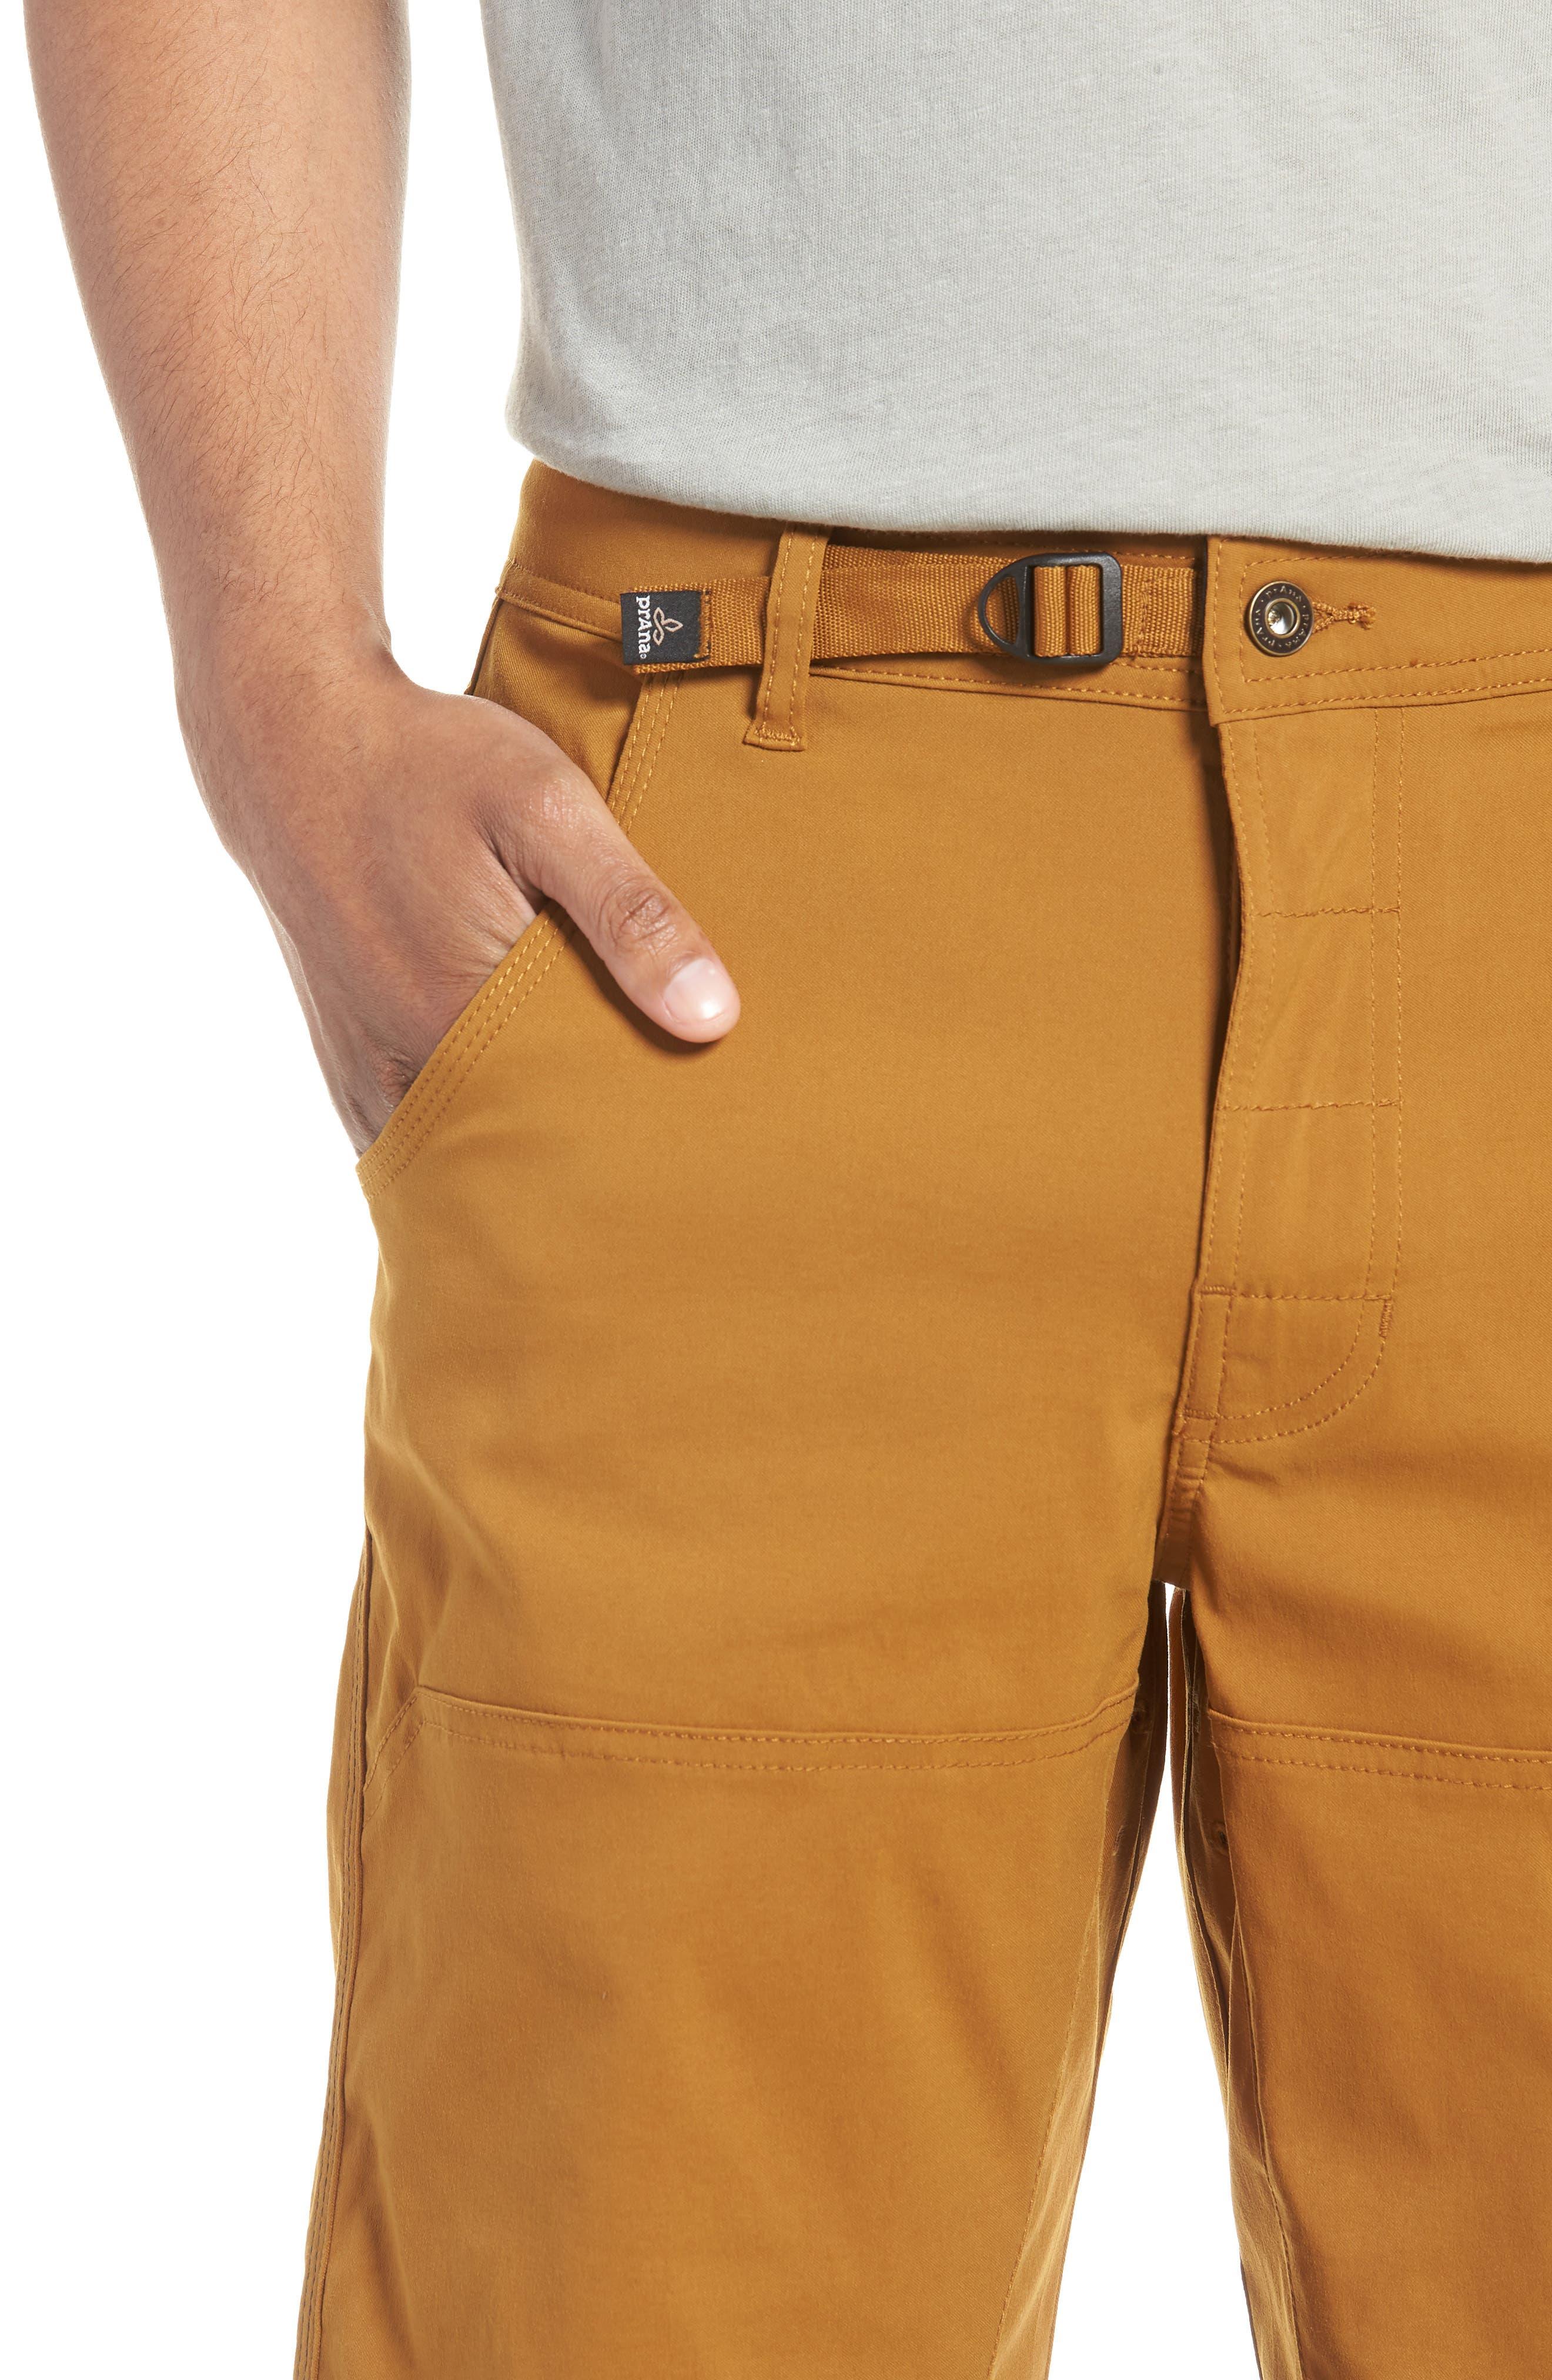 PRANA,                             Zion Stretch Shorts,                             Alternate thumbnail 4, color,                             BRONZED